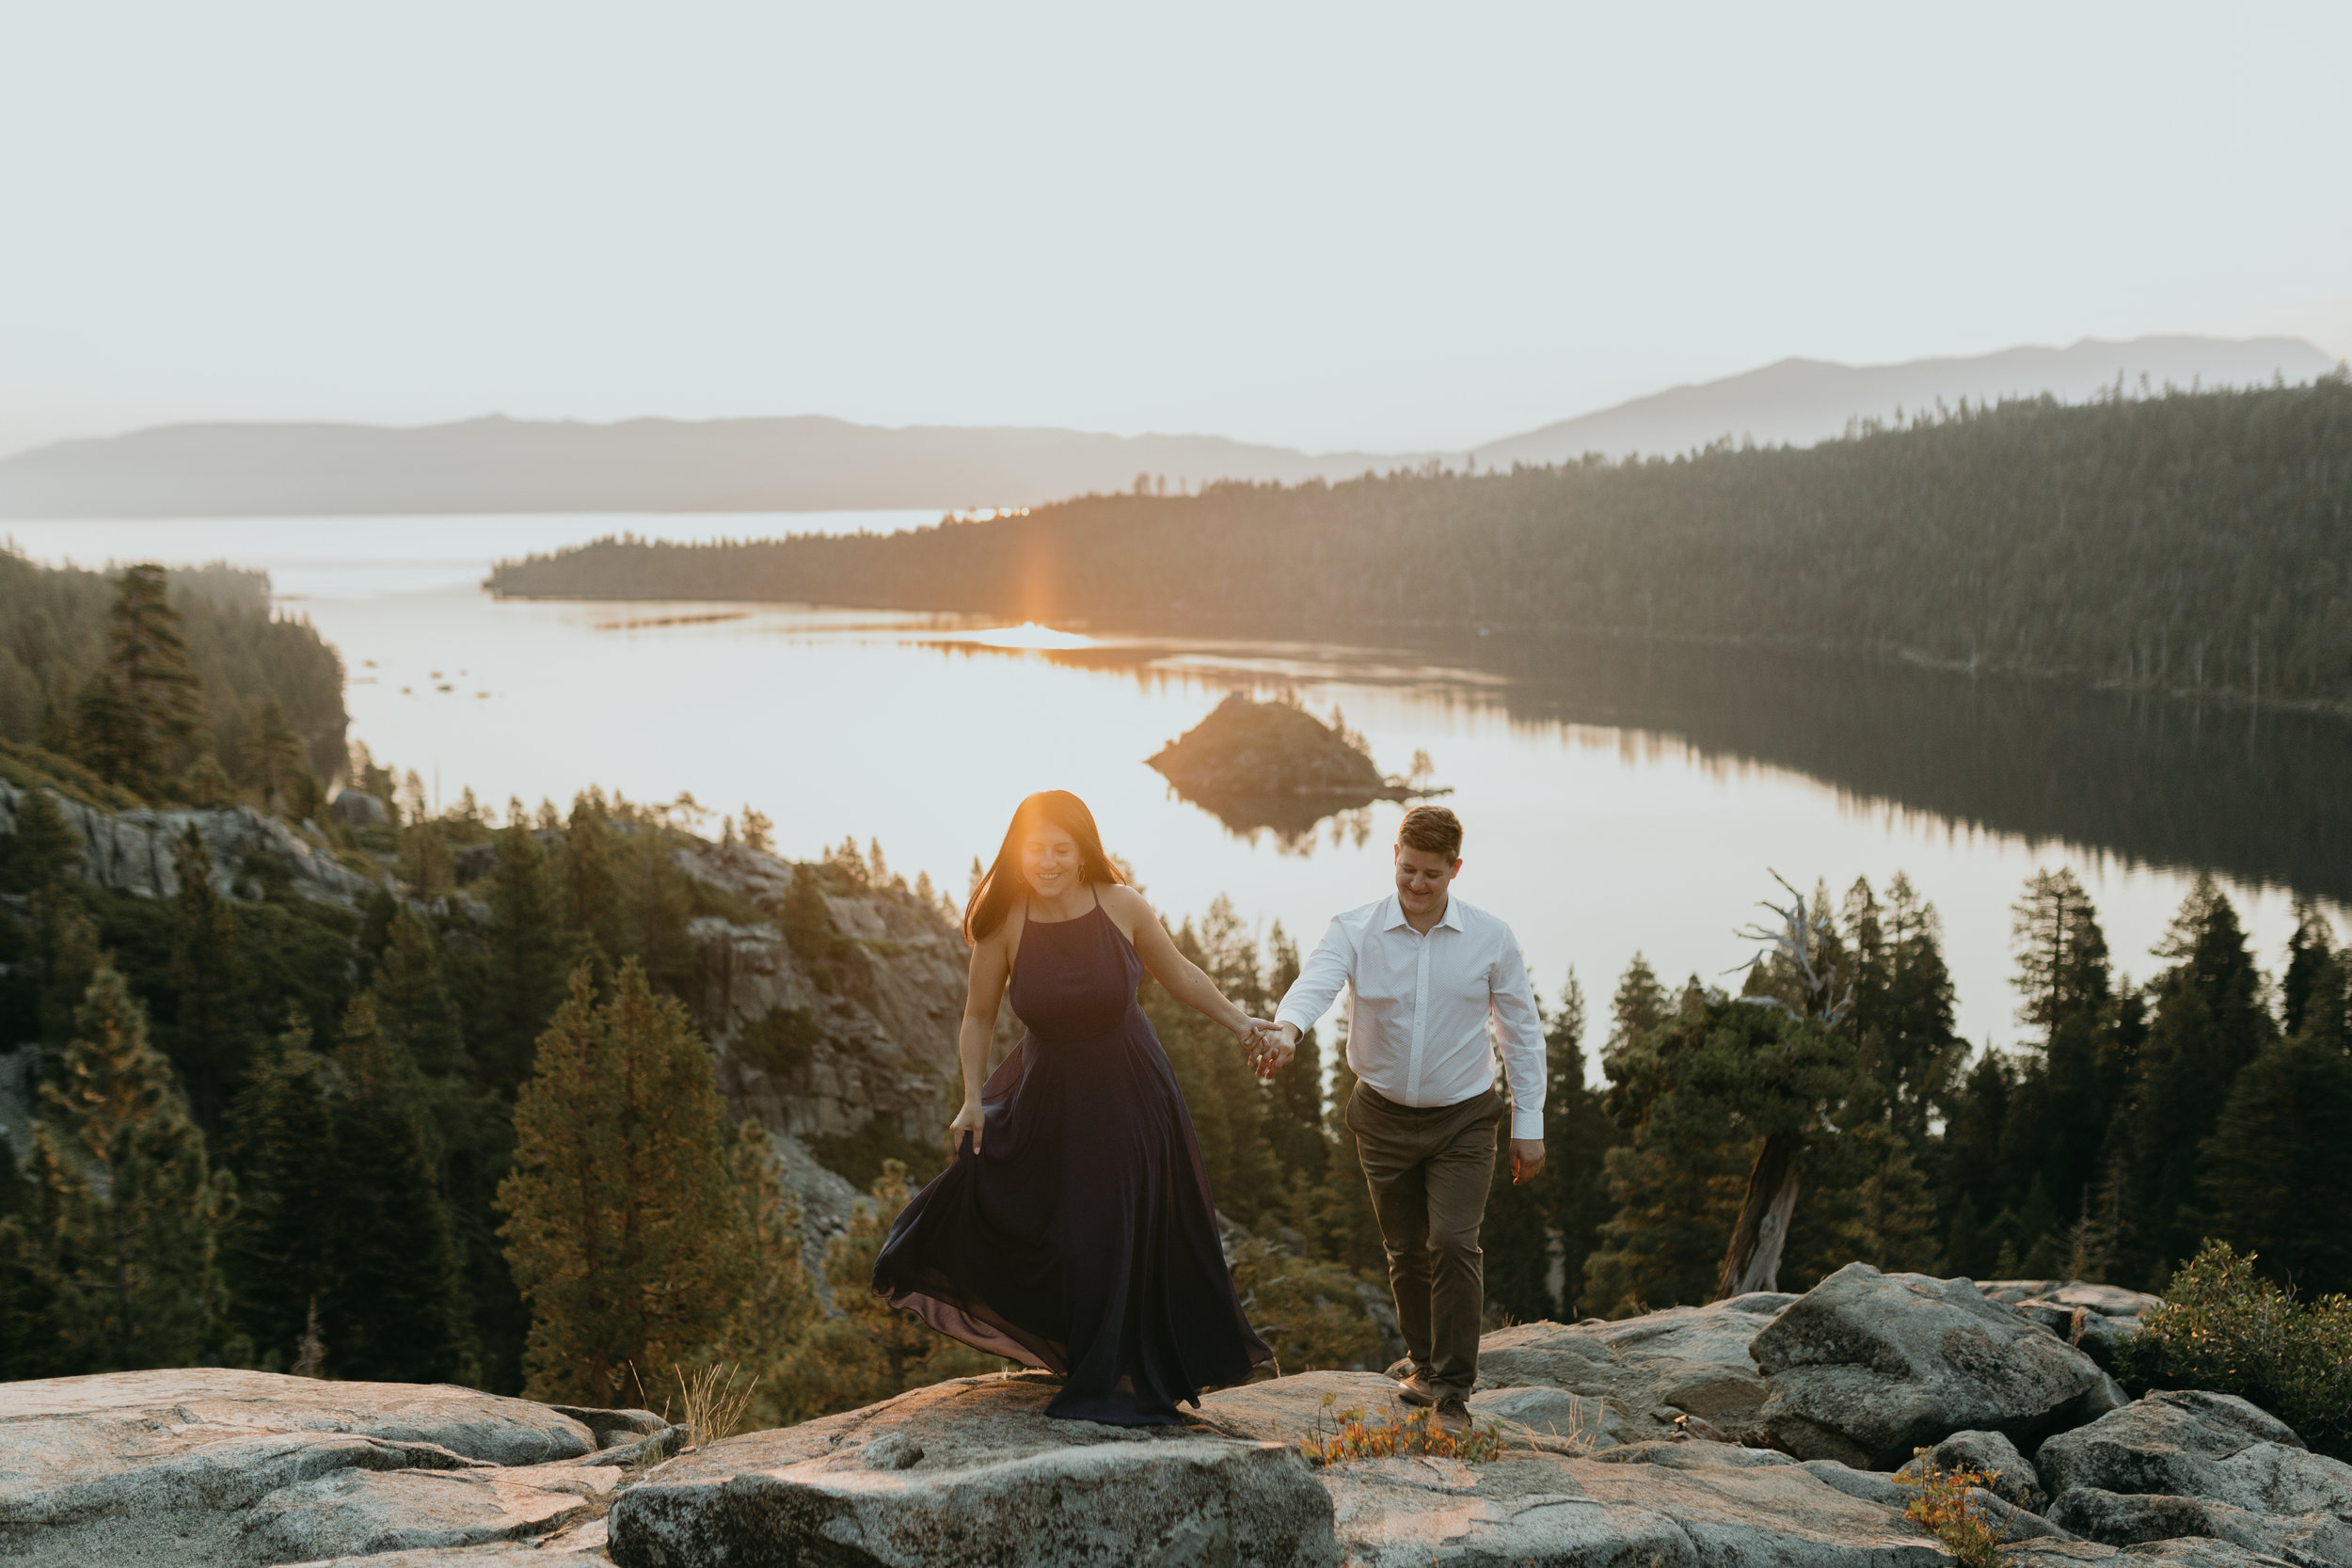 nicole-daacke-photography-lake-tahoe-sunrise-summer-adventure-engagement-photos-nevada-wedding-elopement-photographer-golden-emerald-bay-light-pine-trees-summer-vibe-fun-carefree-authentic-love-19.jpg